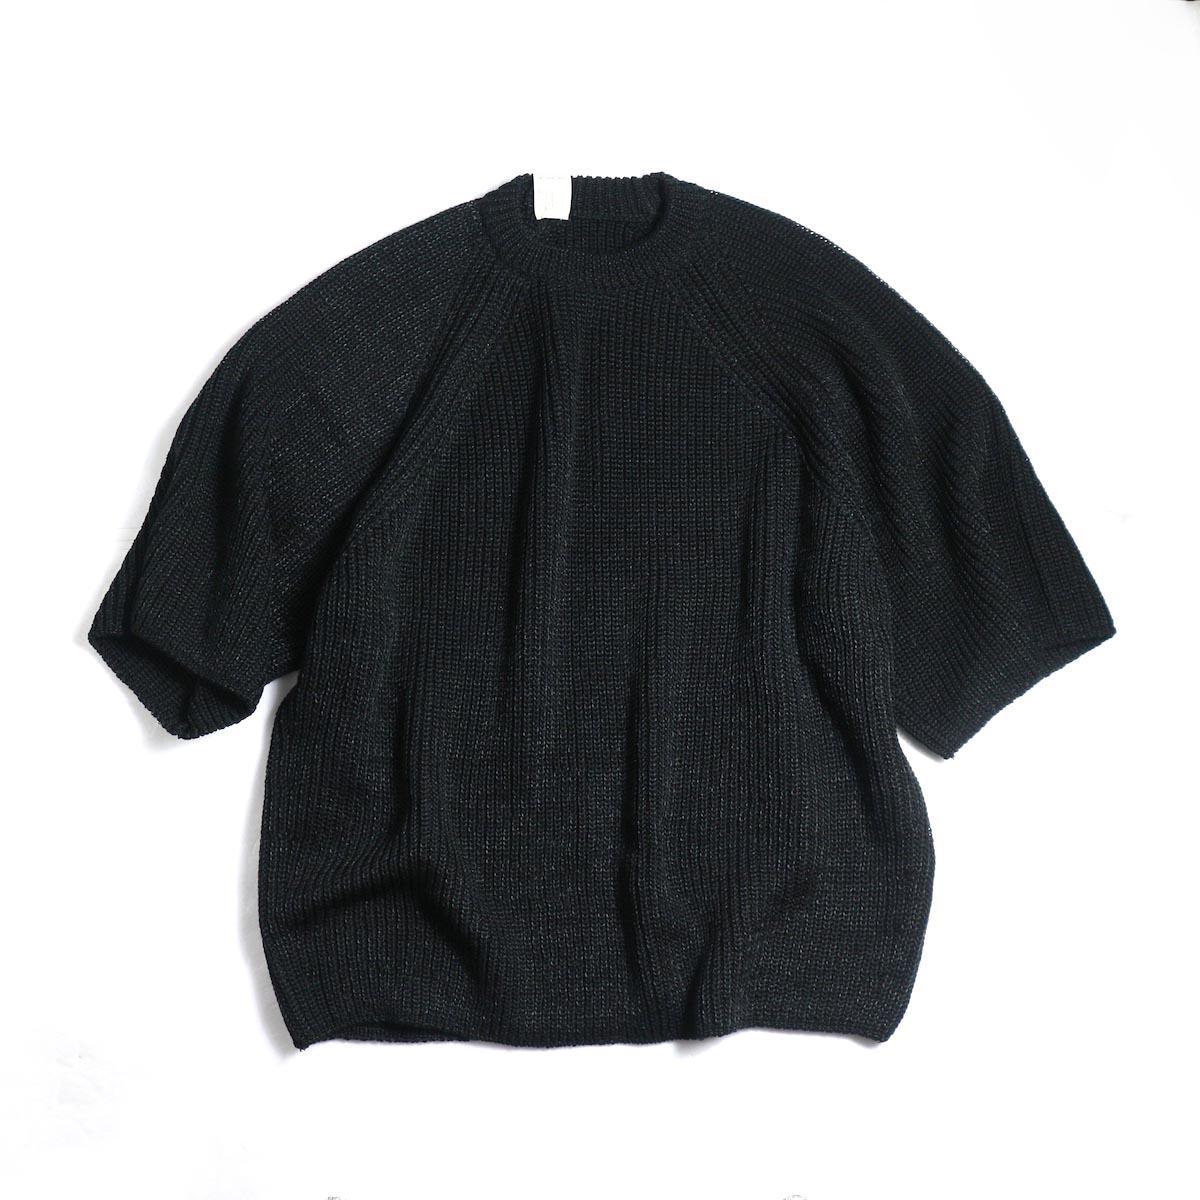 N.HOOLYWOOD / 191-KT05-063pieces Short Sleeve Knit -Black